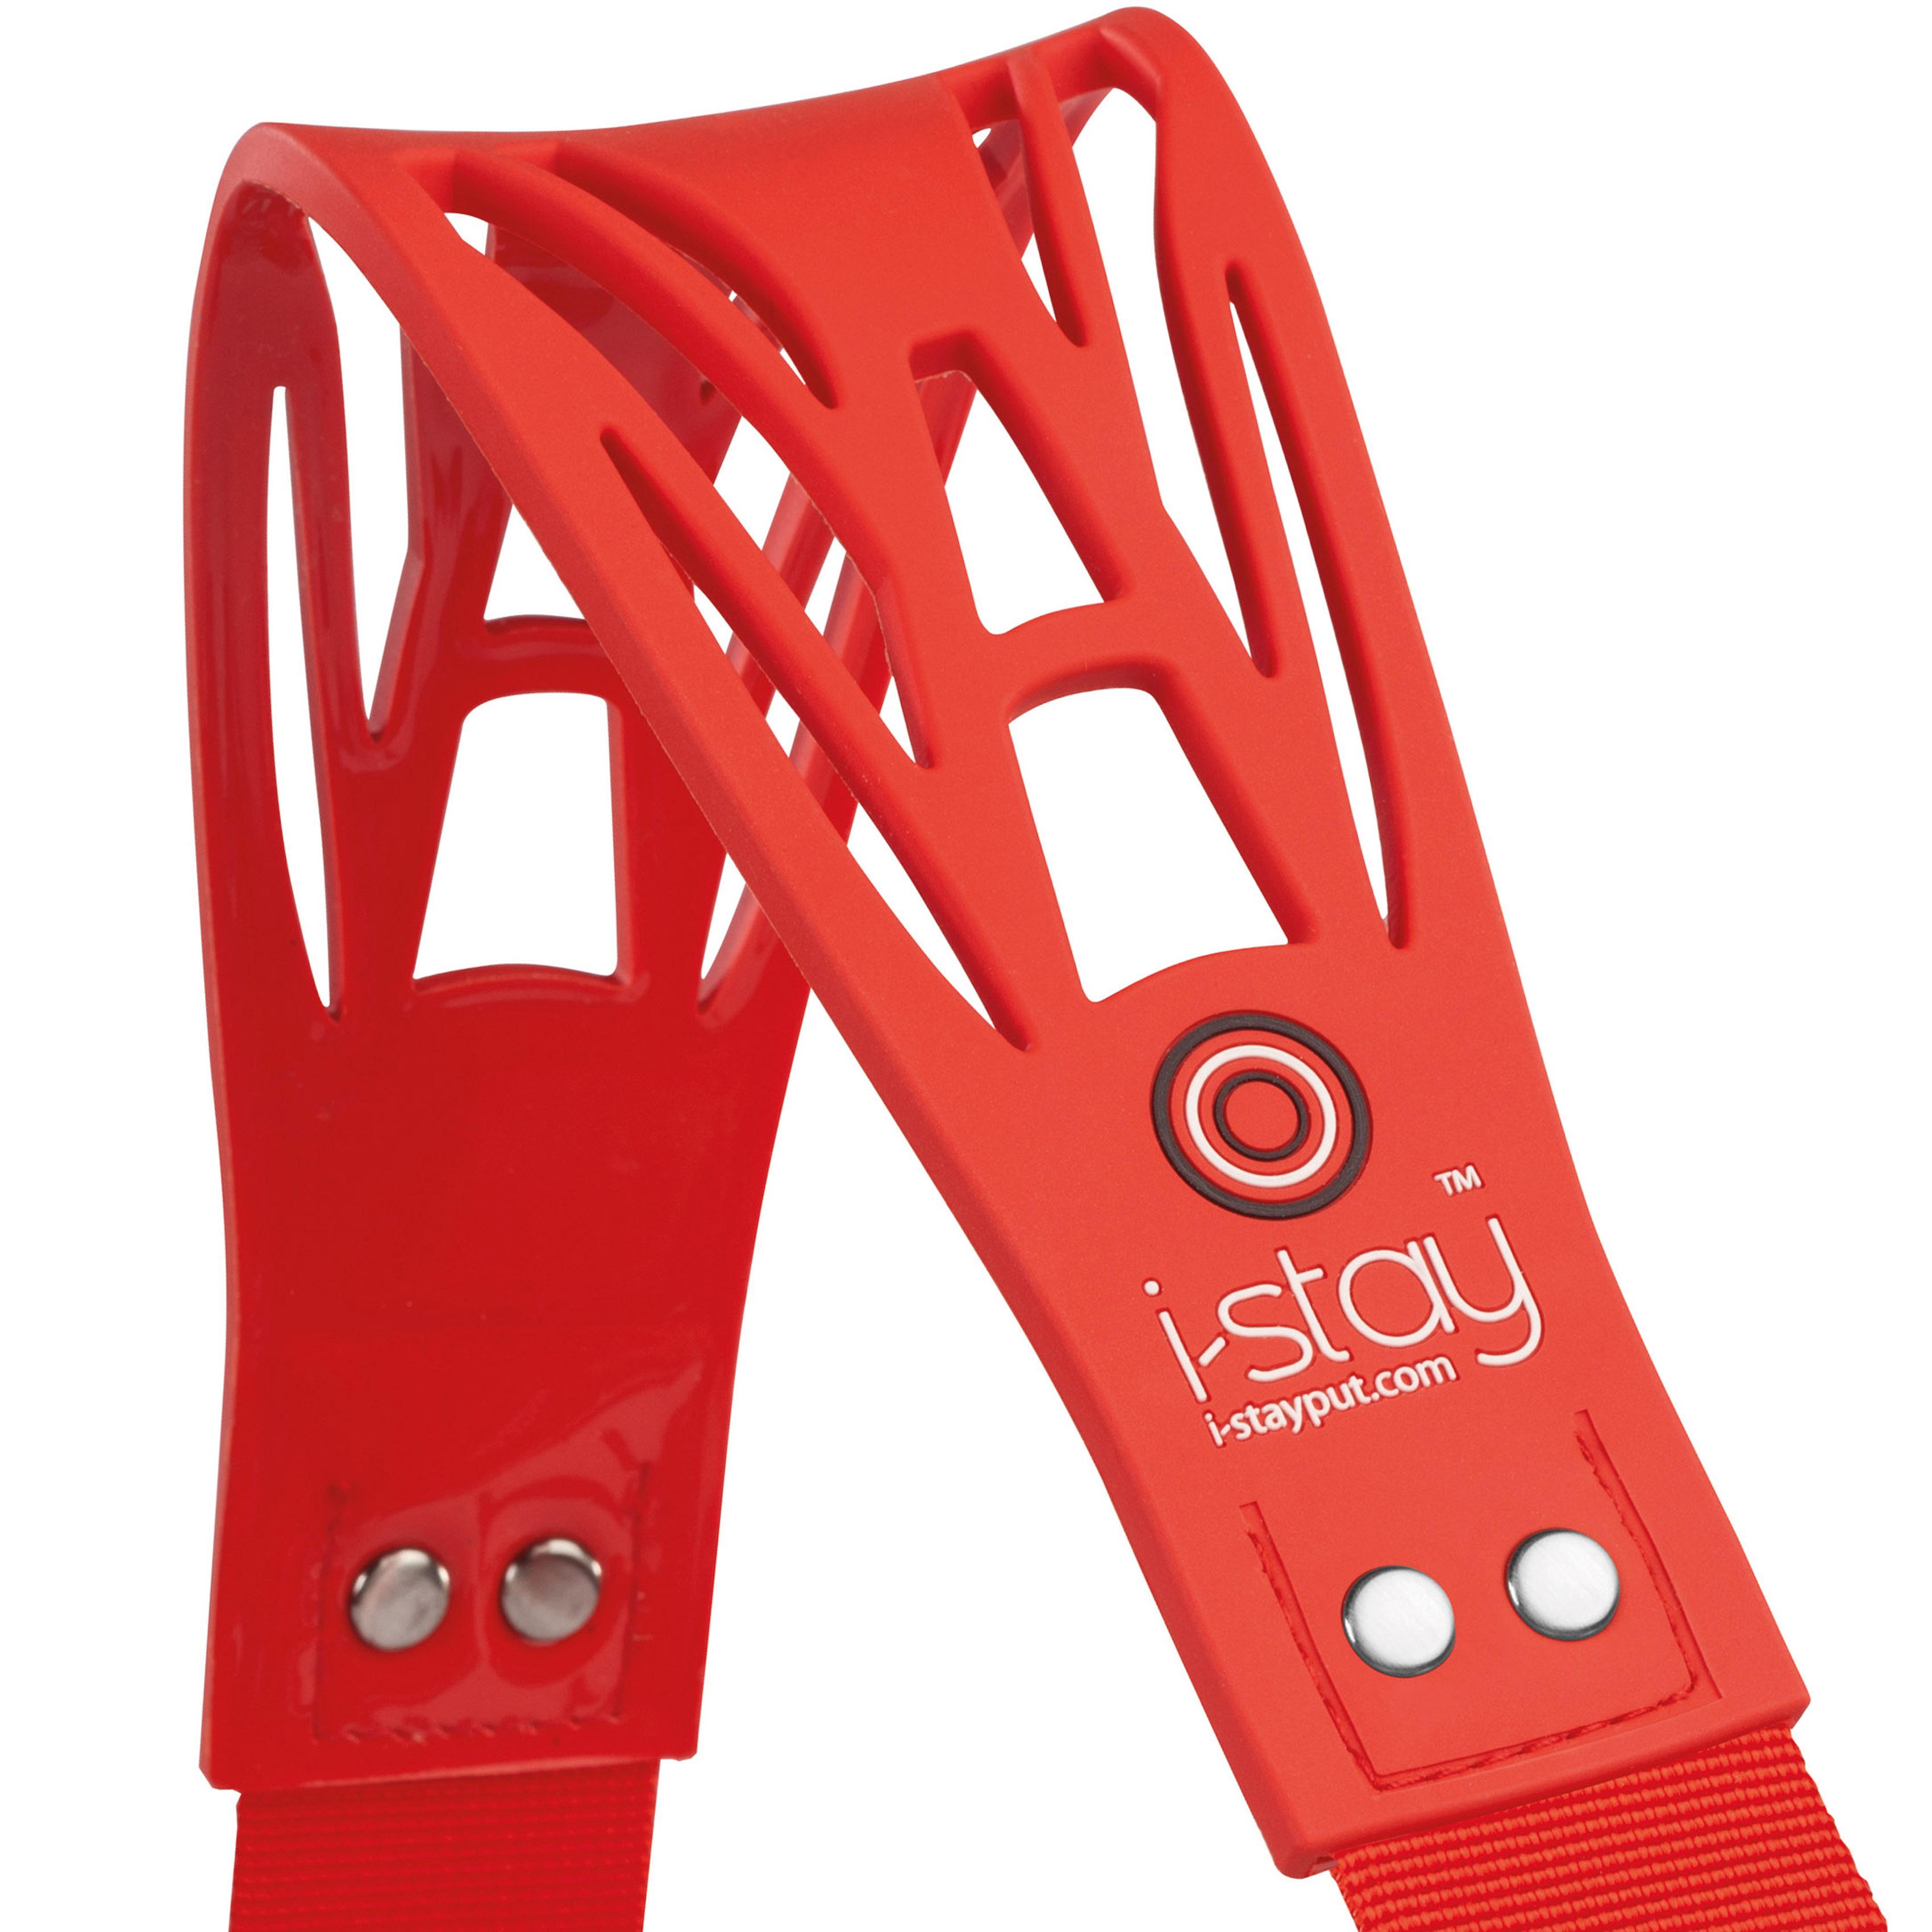 Popruh i-stay červená